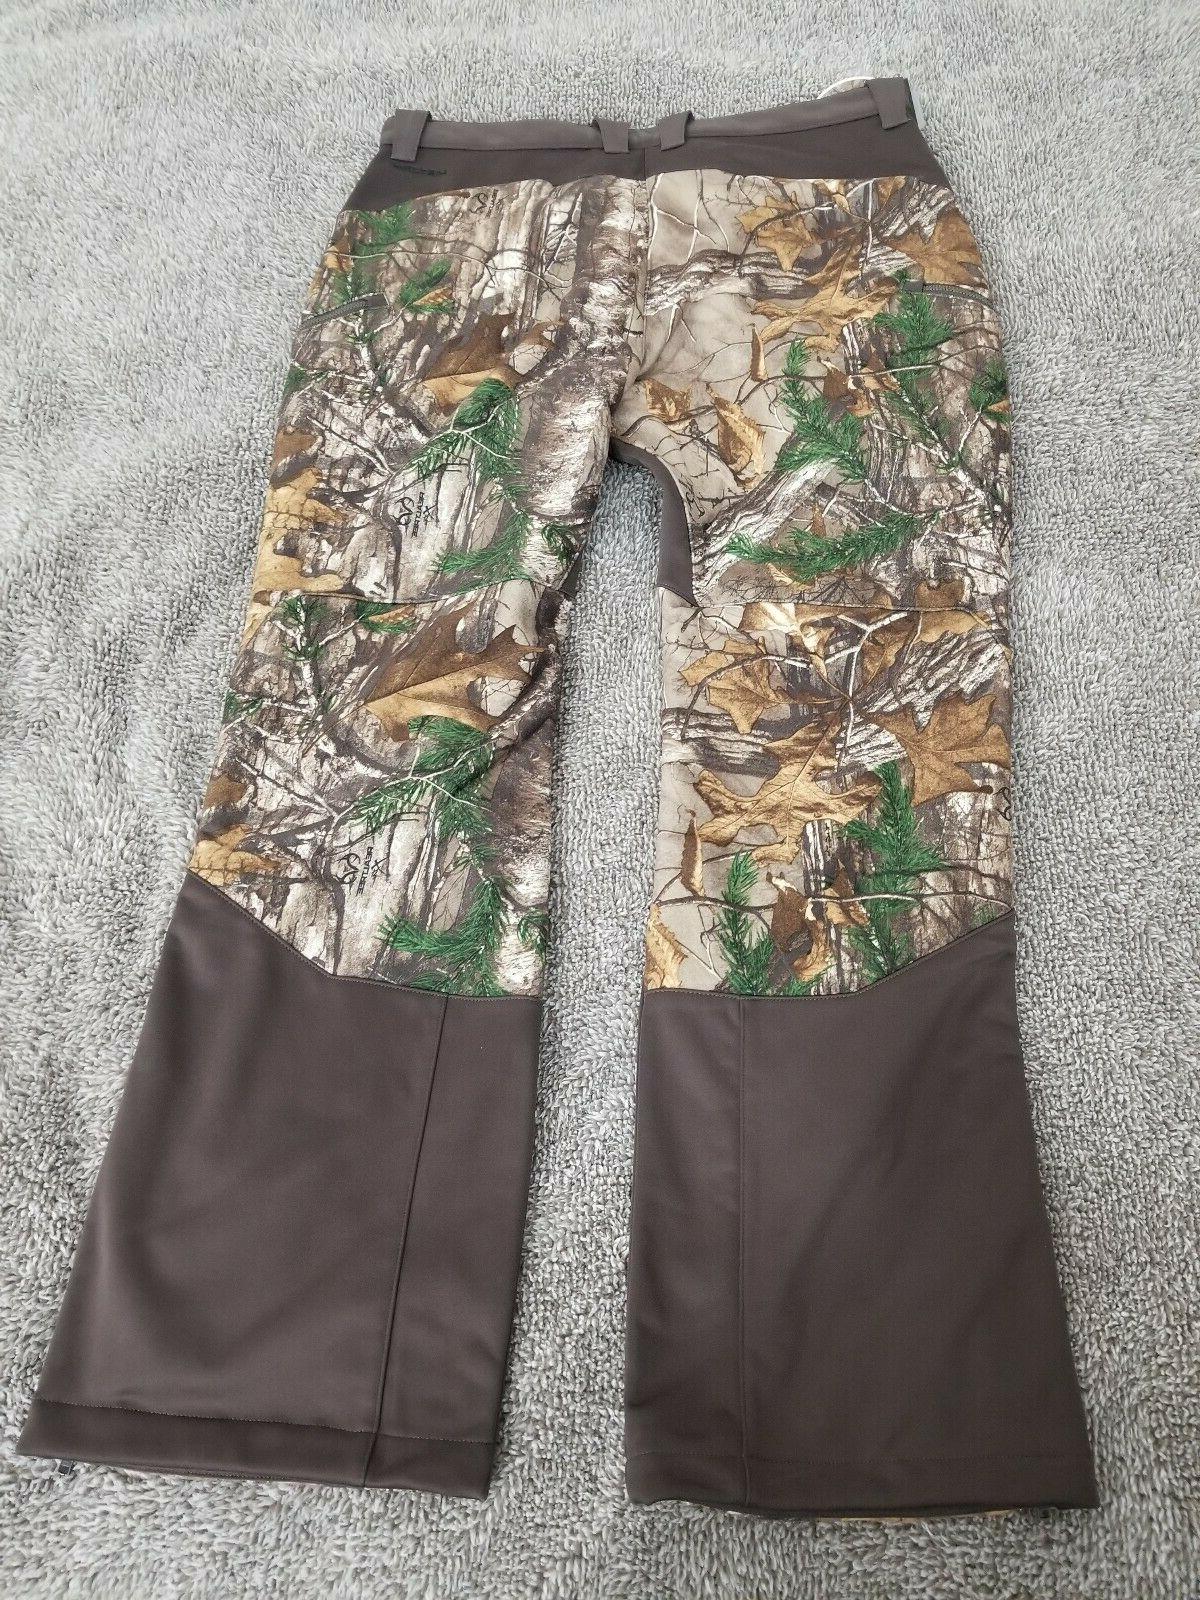 Under Armour Fleece Cold Season Pant Size 36x32